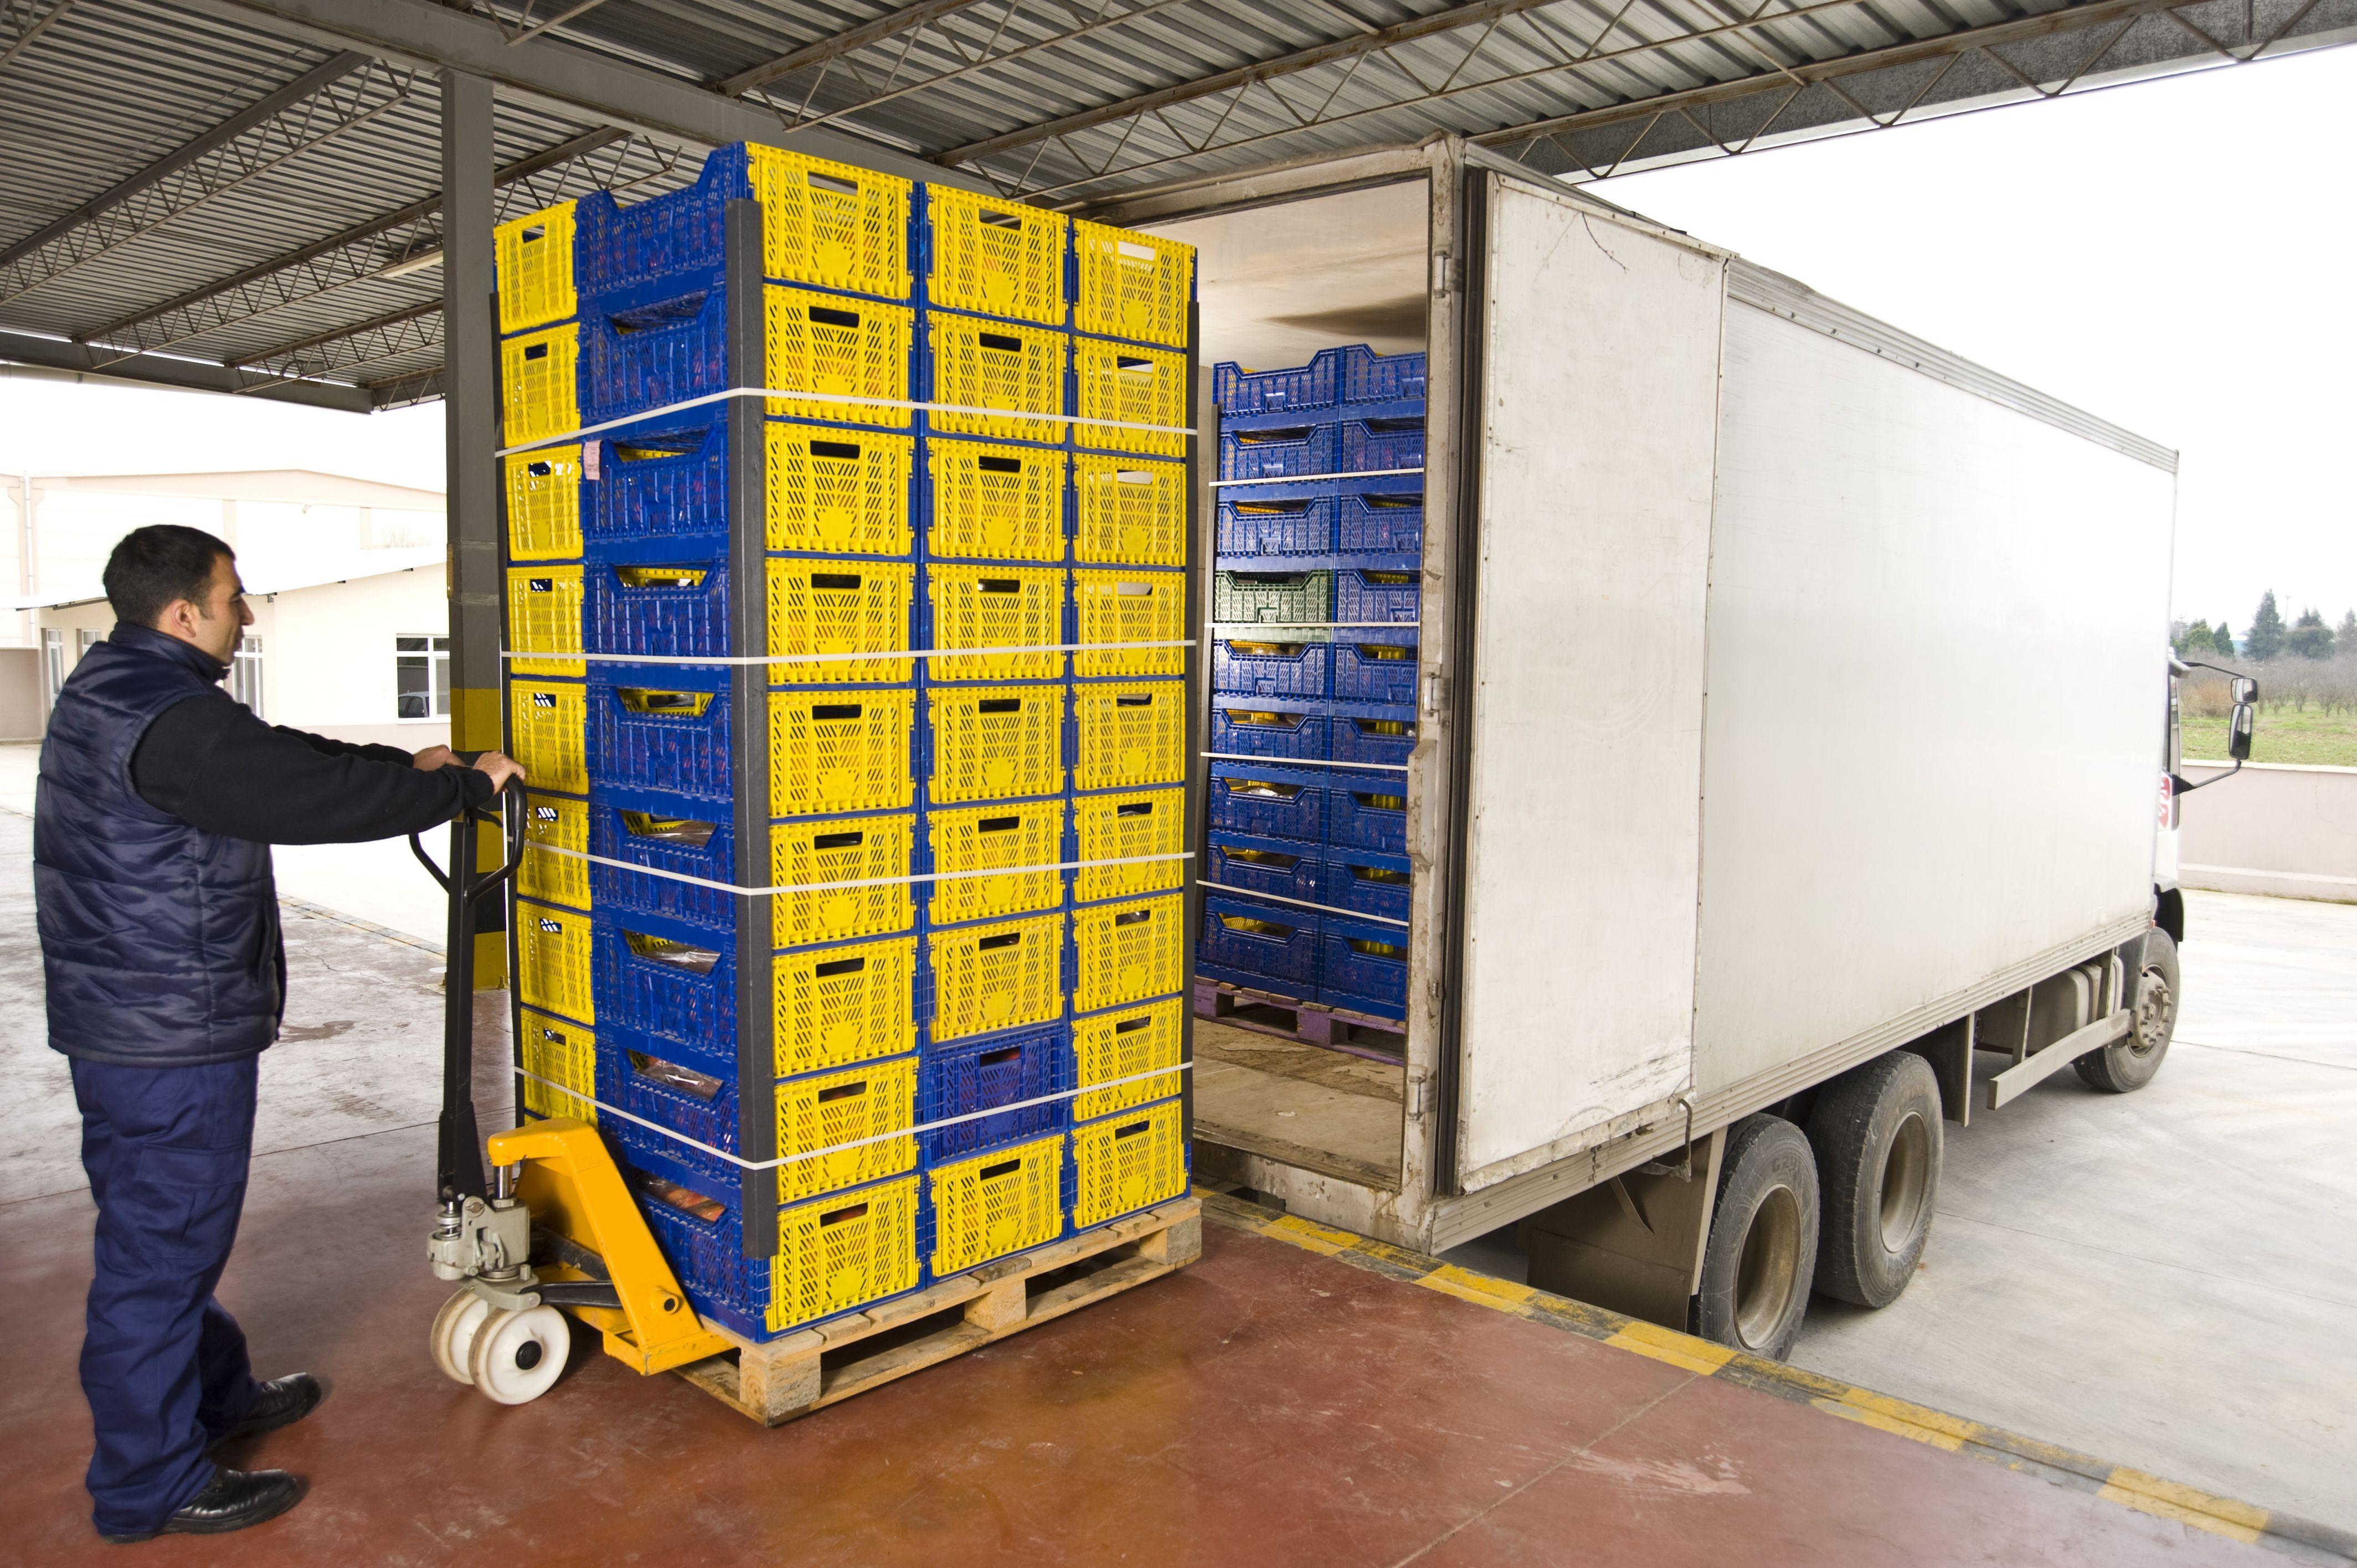 Transporte de mercancías: Servicios de transporte de Tolcatrans